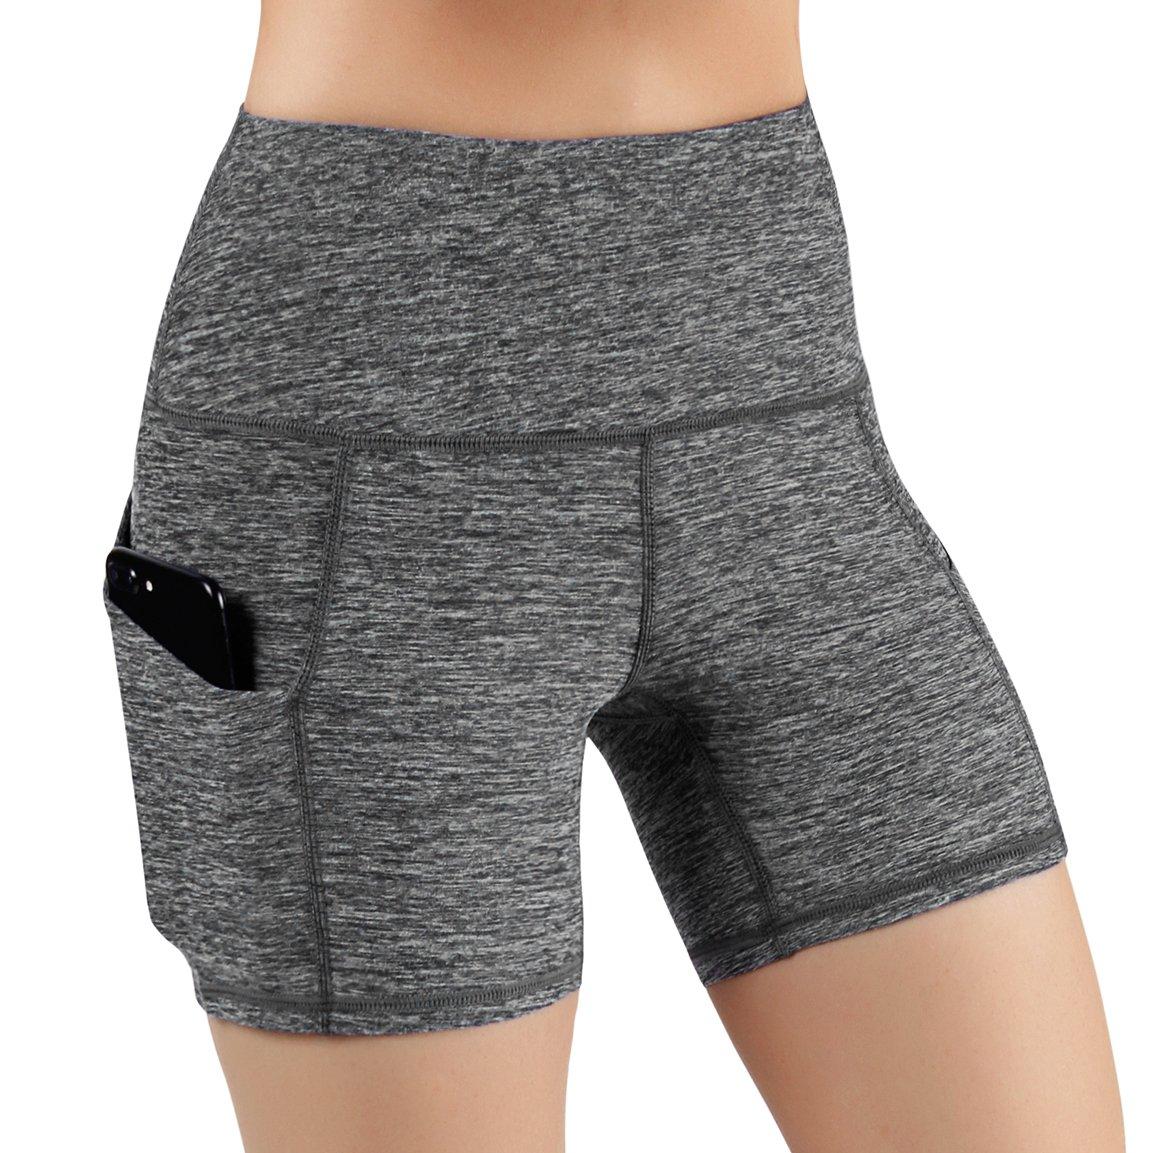 ODODOS High Waist Out Pocket Yoga Short Tummy Control Workout Running Athletic Non See-Through Yoga Shorts,GrayHeather,X-Small by ODODOS